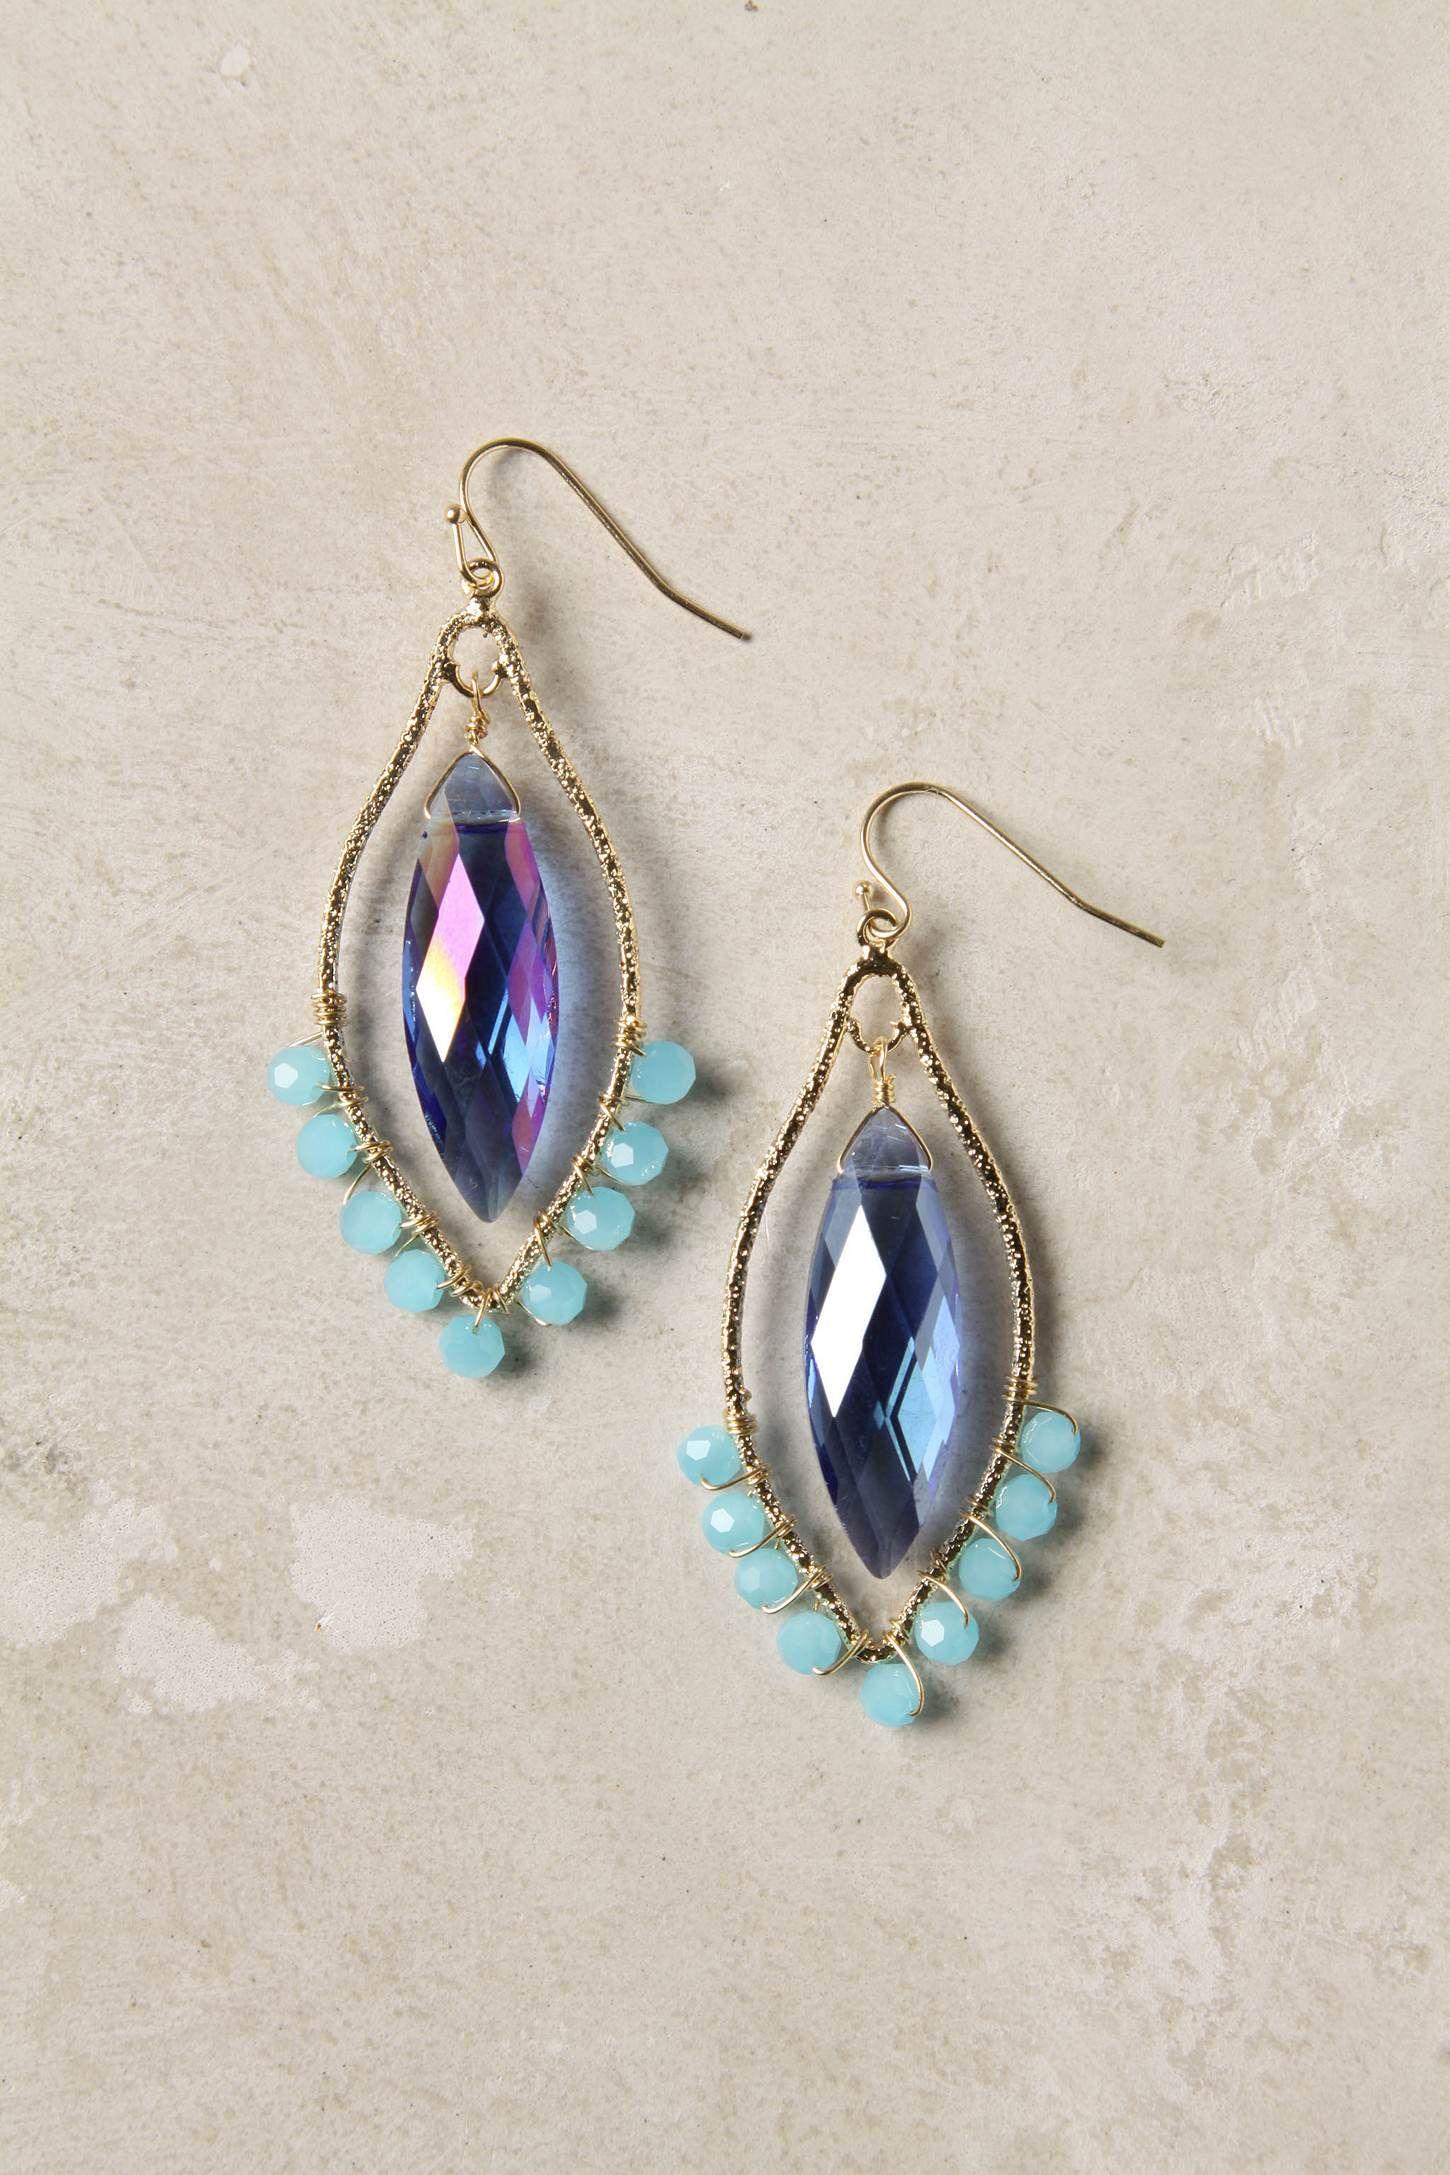 Clara chandelier earrings anthropologie jewel box earrings clara chandelier earrings anthropologie arubaitofo Images